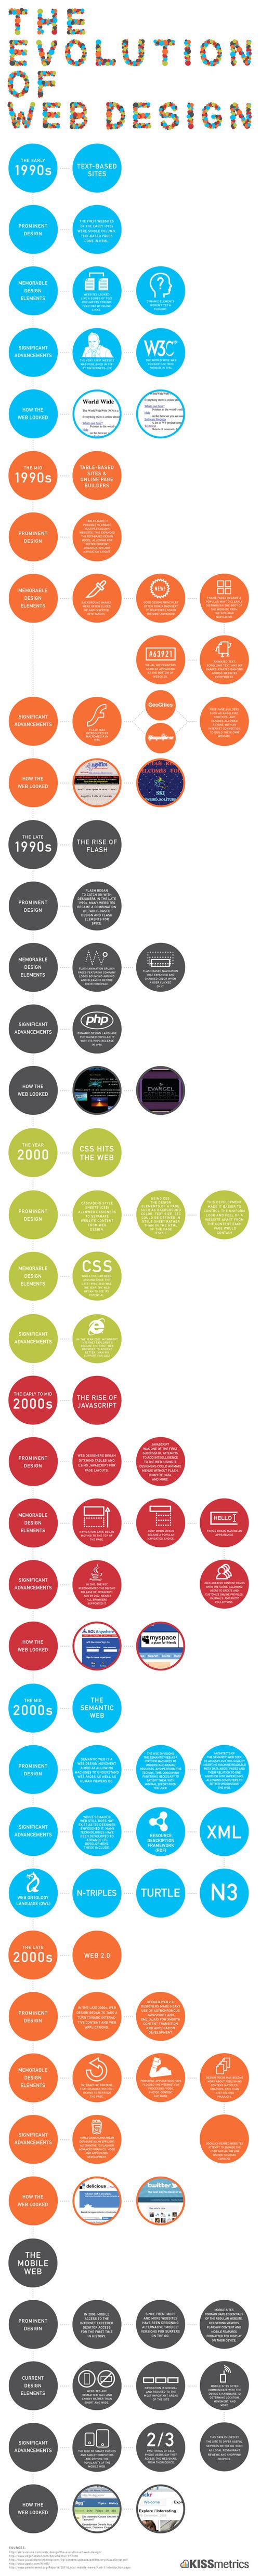 Evolutionwebdesignfull